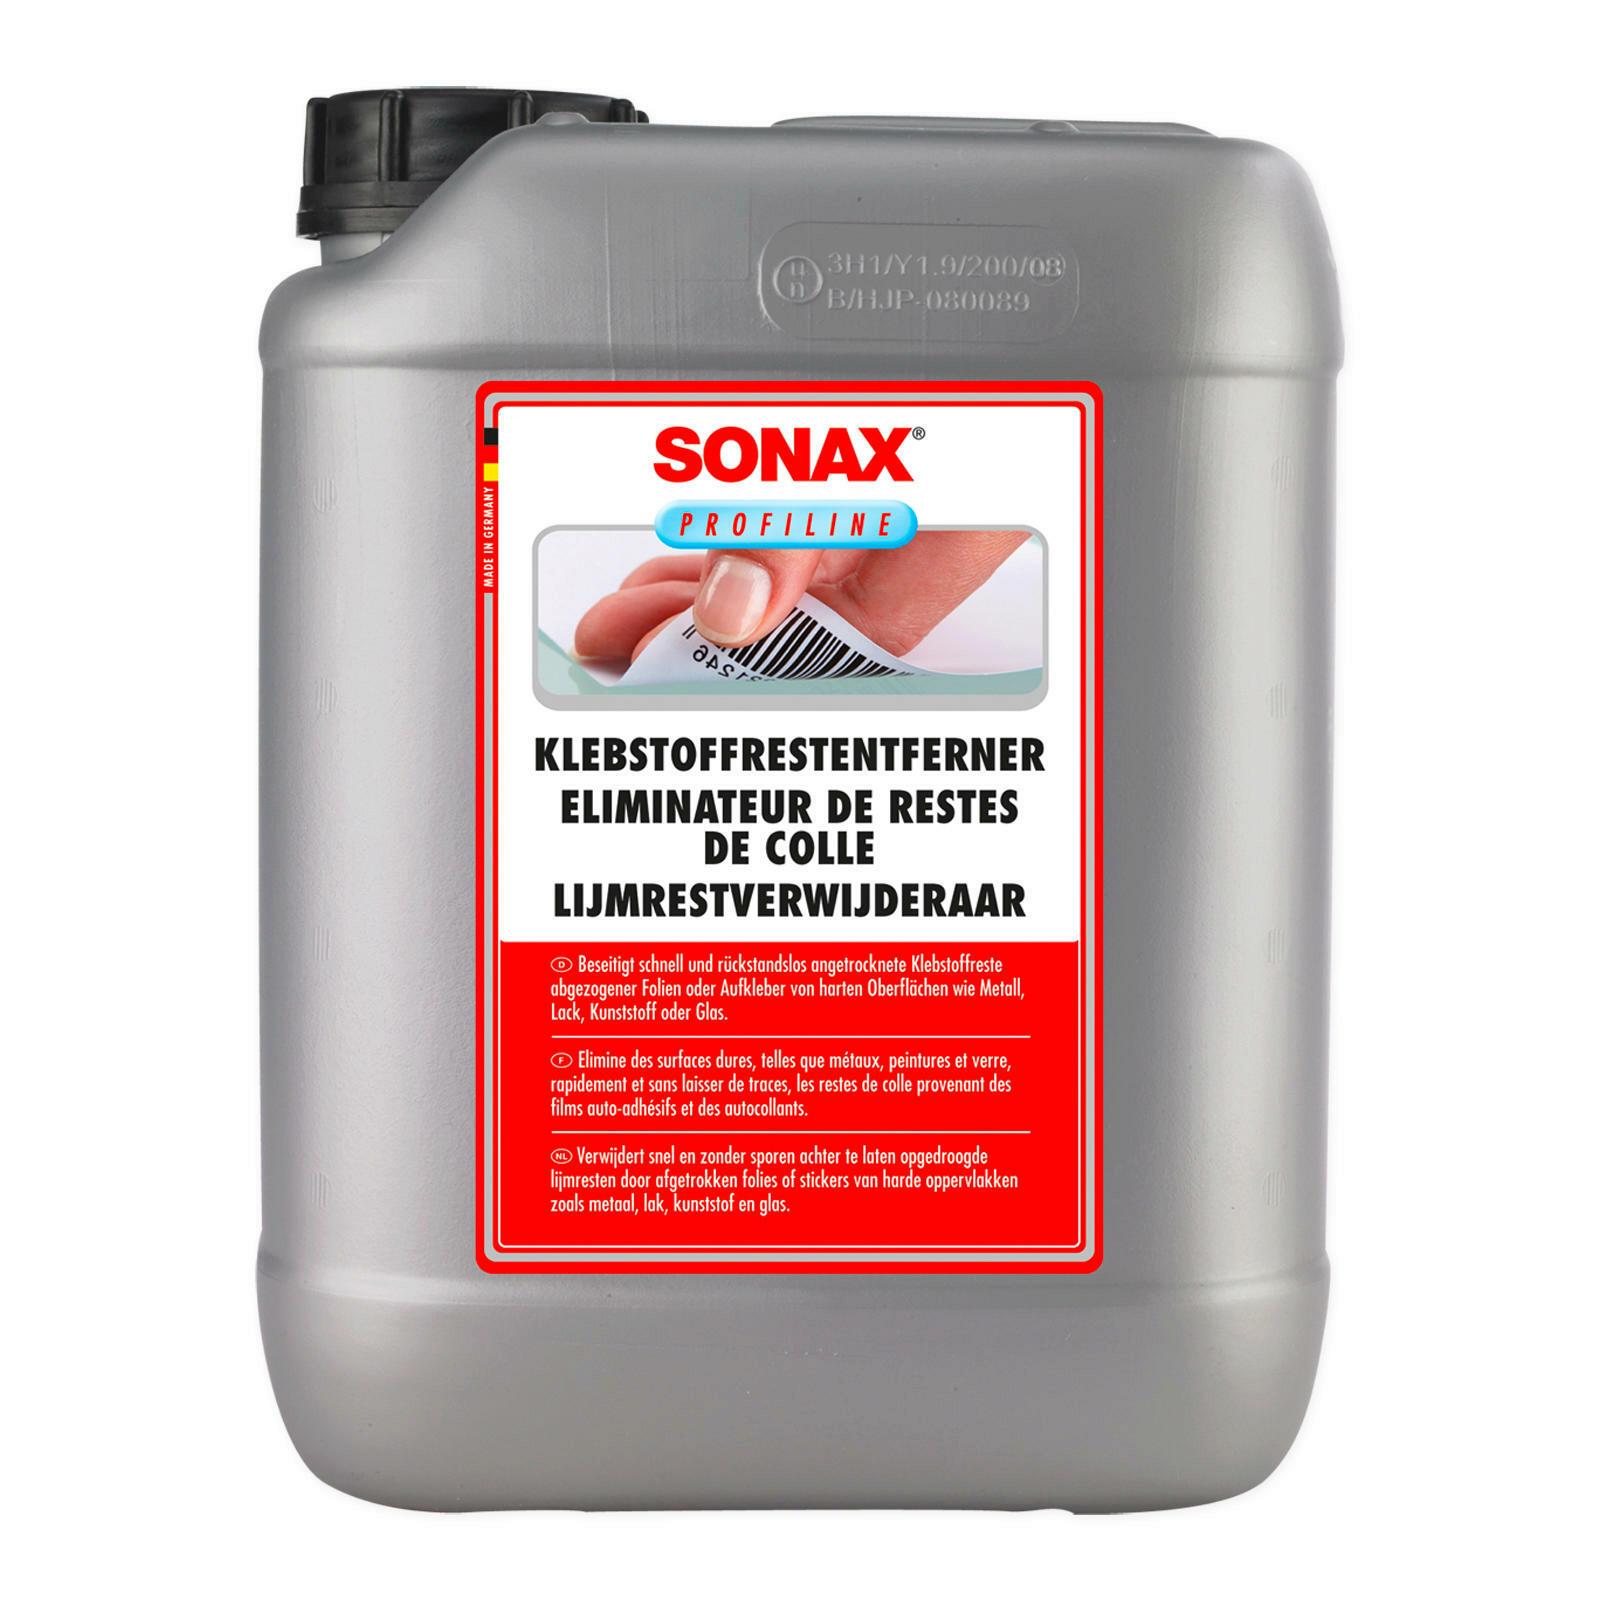 Sonax PROFILINE Klebstoffentferner 5L